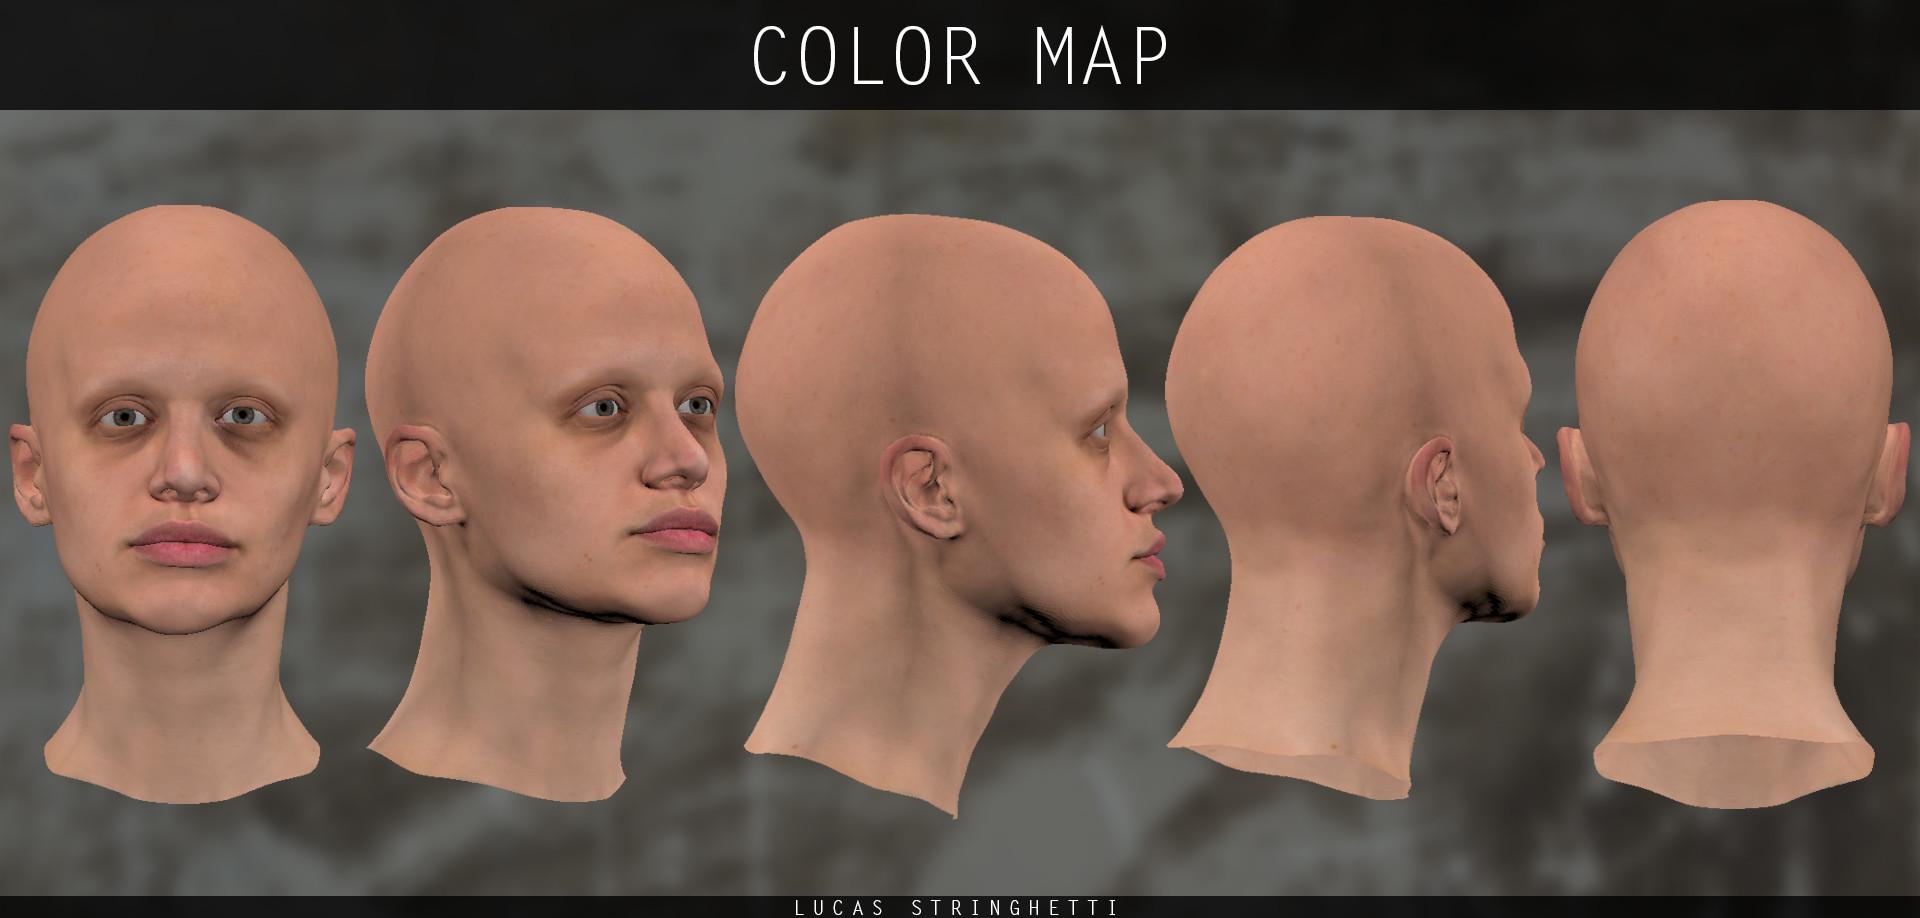 Lucas stringhetti 01 colormap